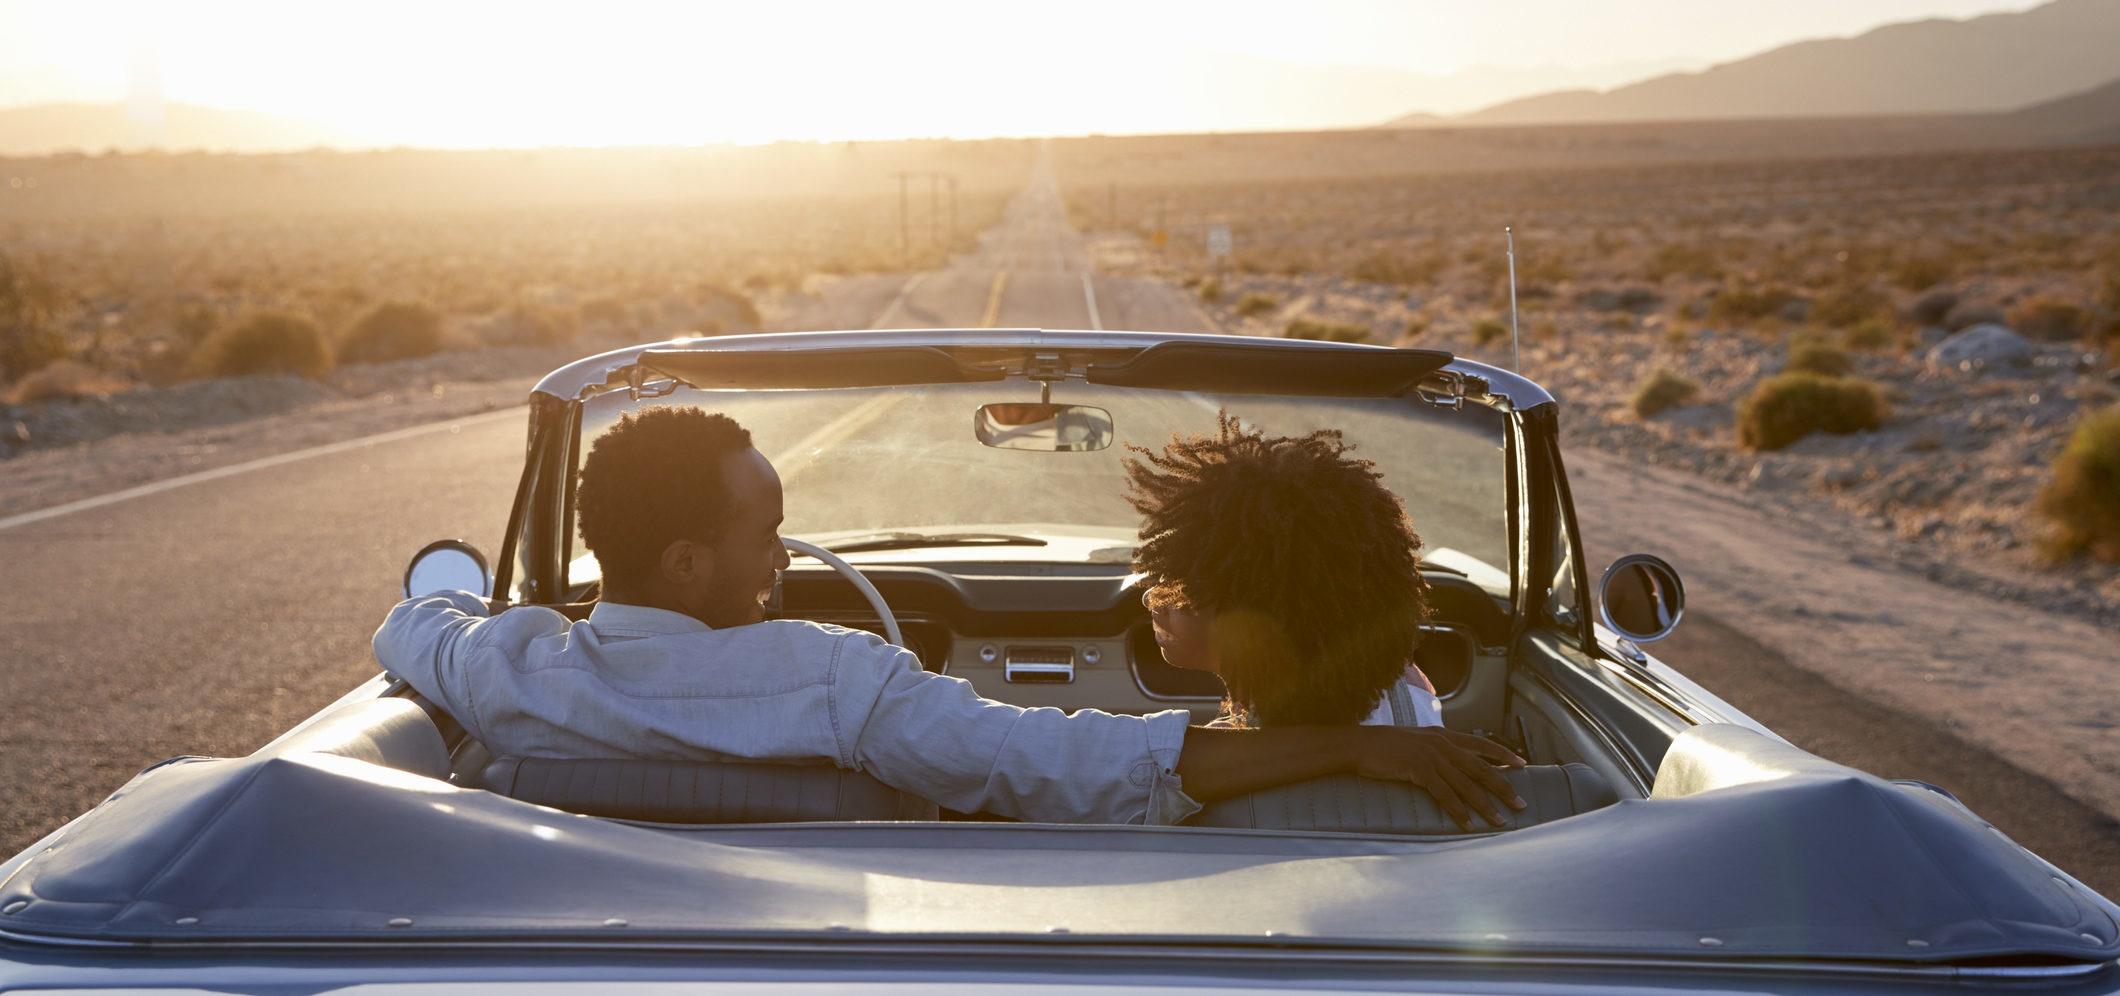 Casal viaja de carro